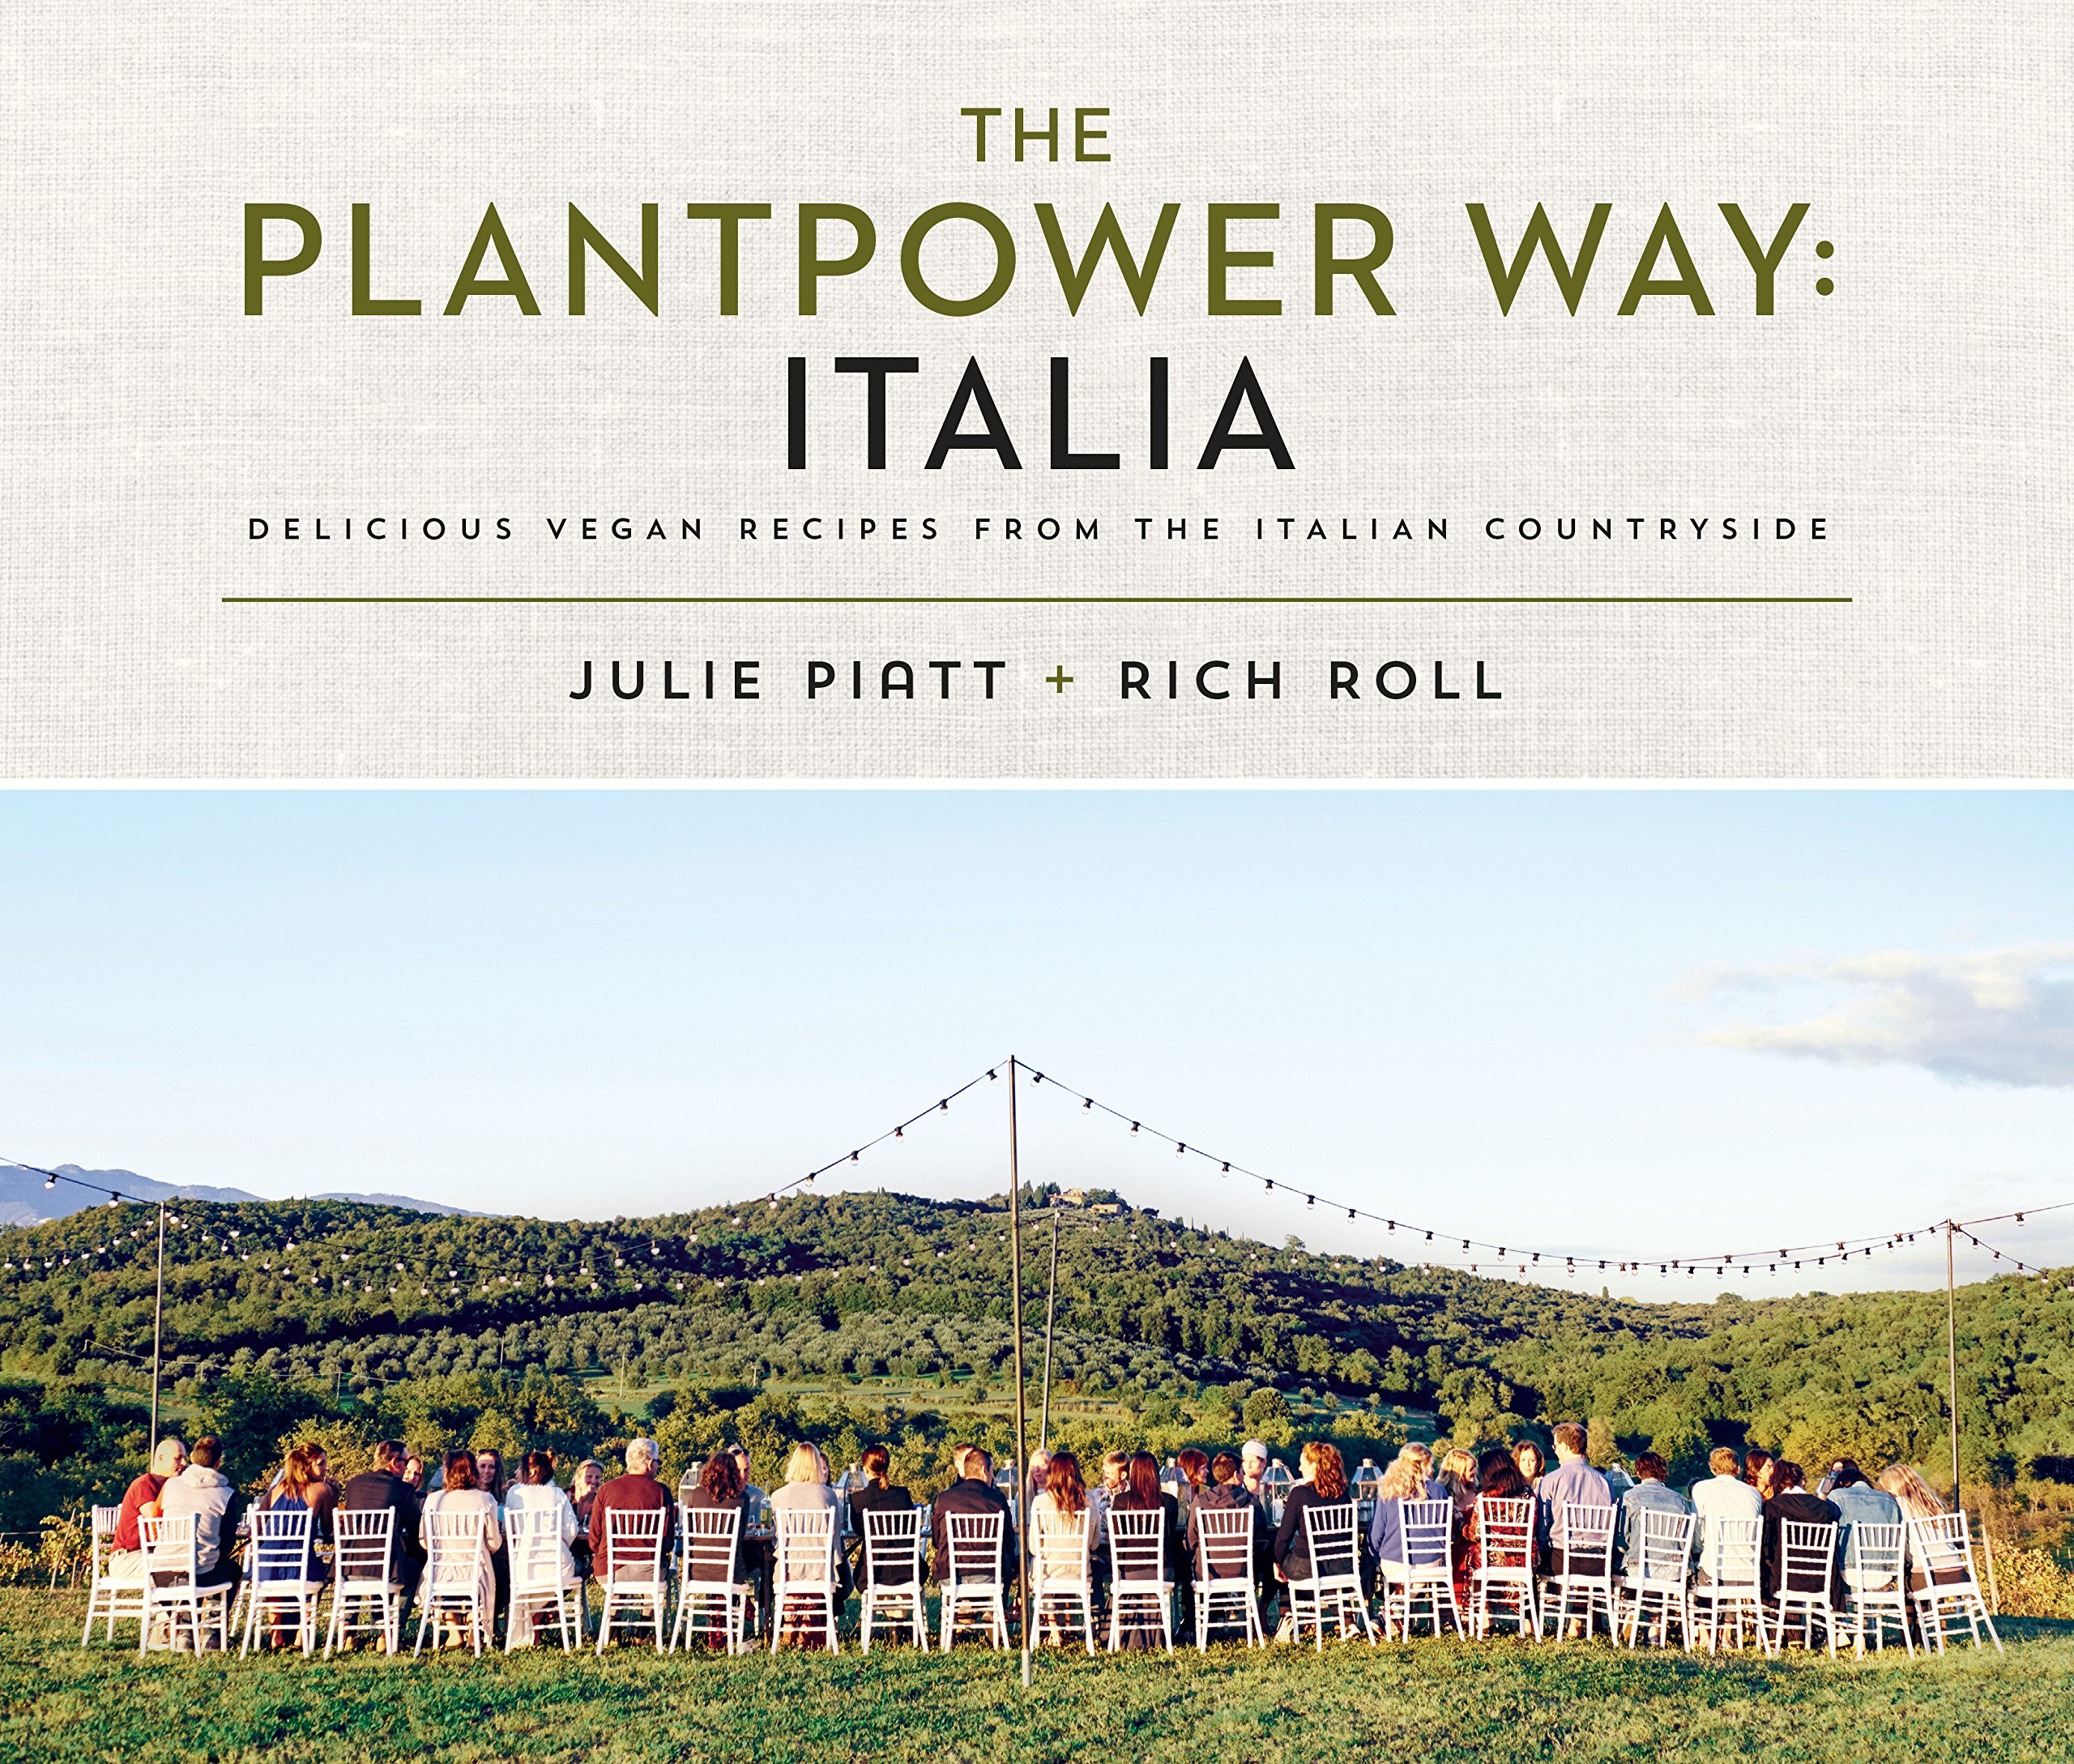 The Plantpower Way: Italia: Delicious Vegan Recipes from the Italian Countryside pdf